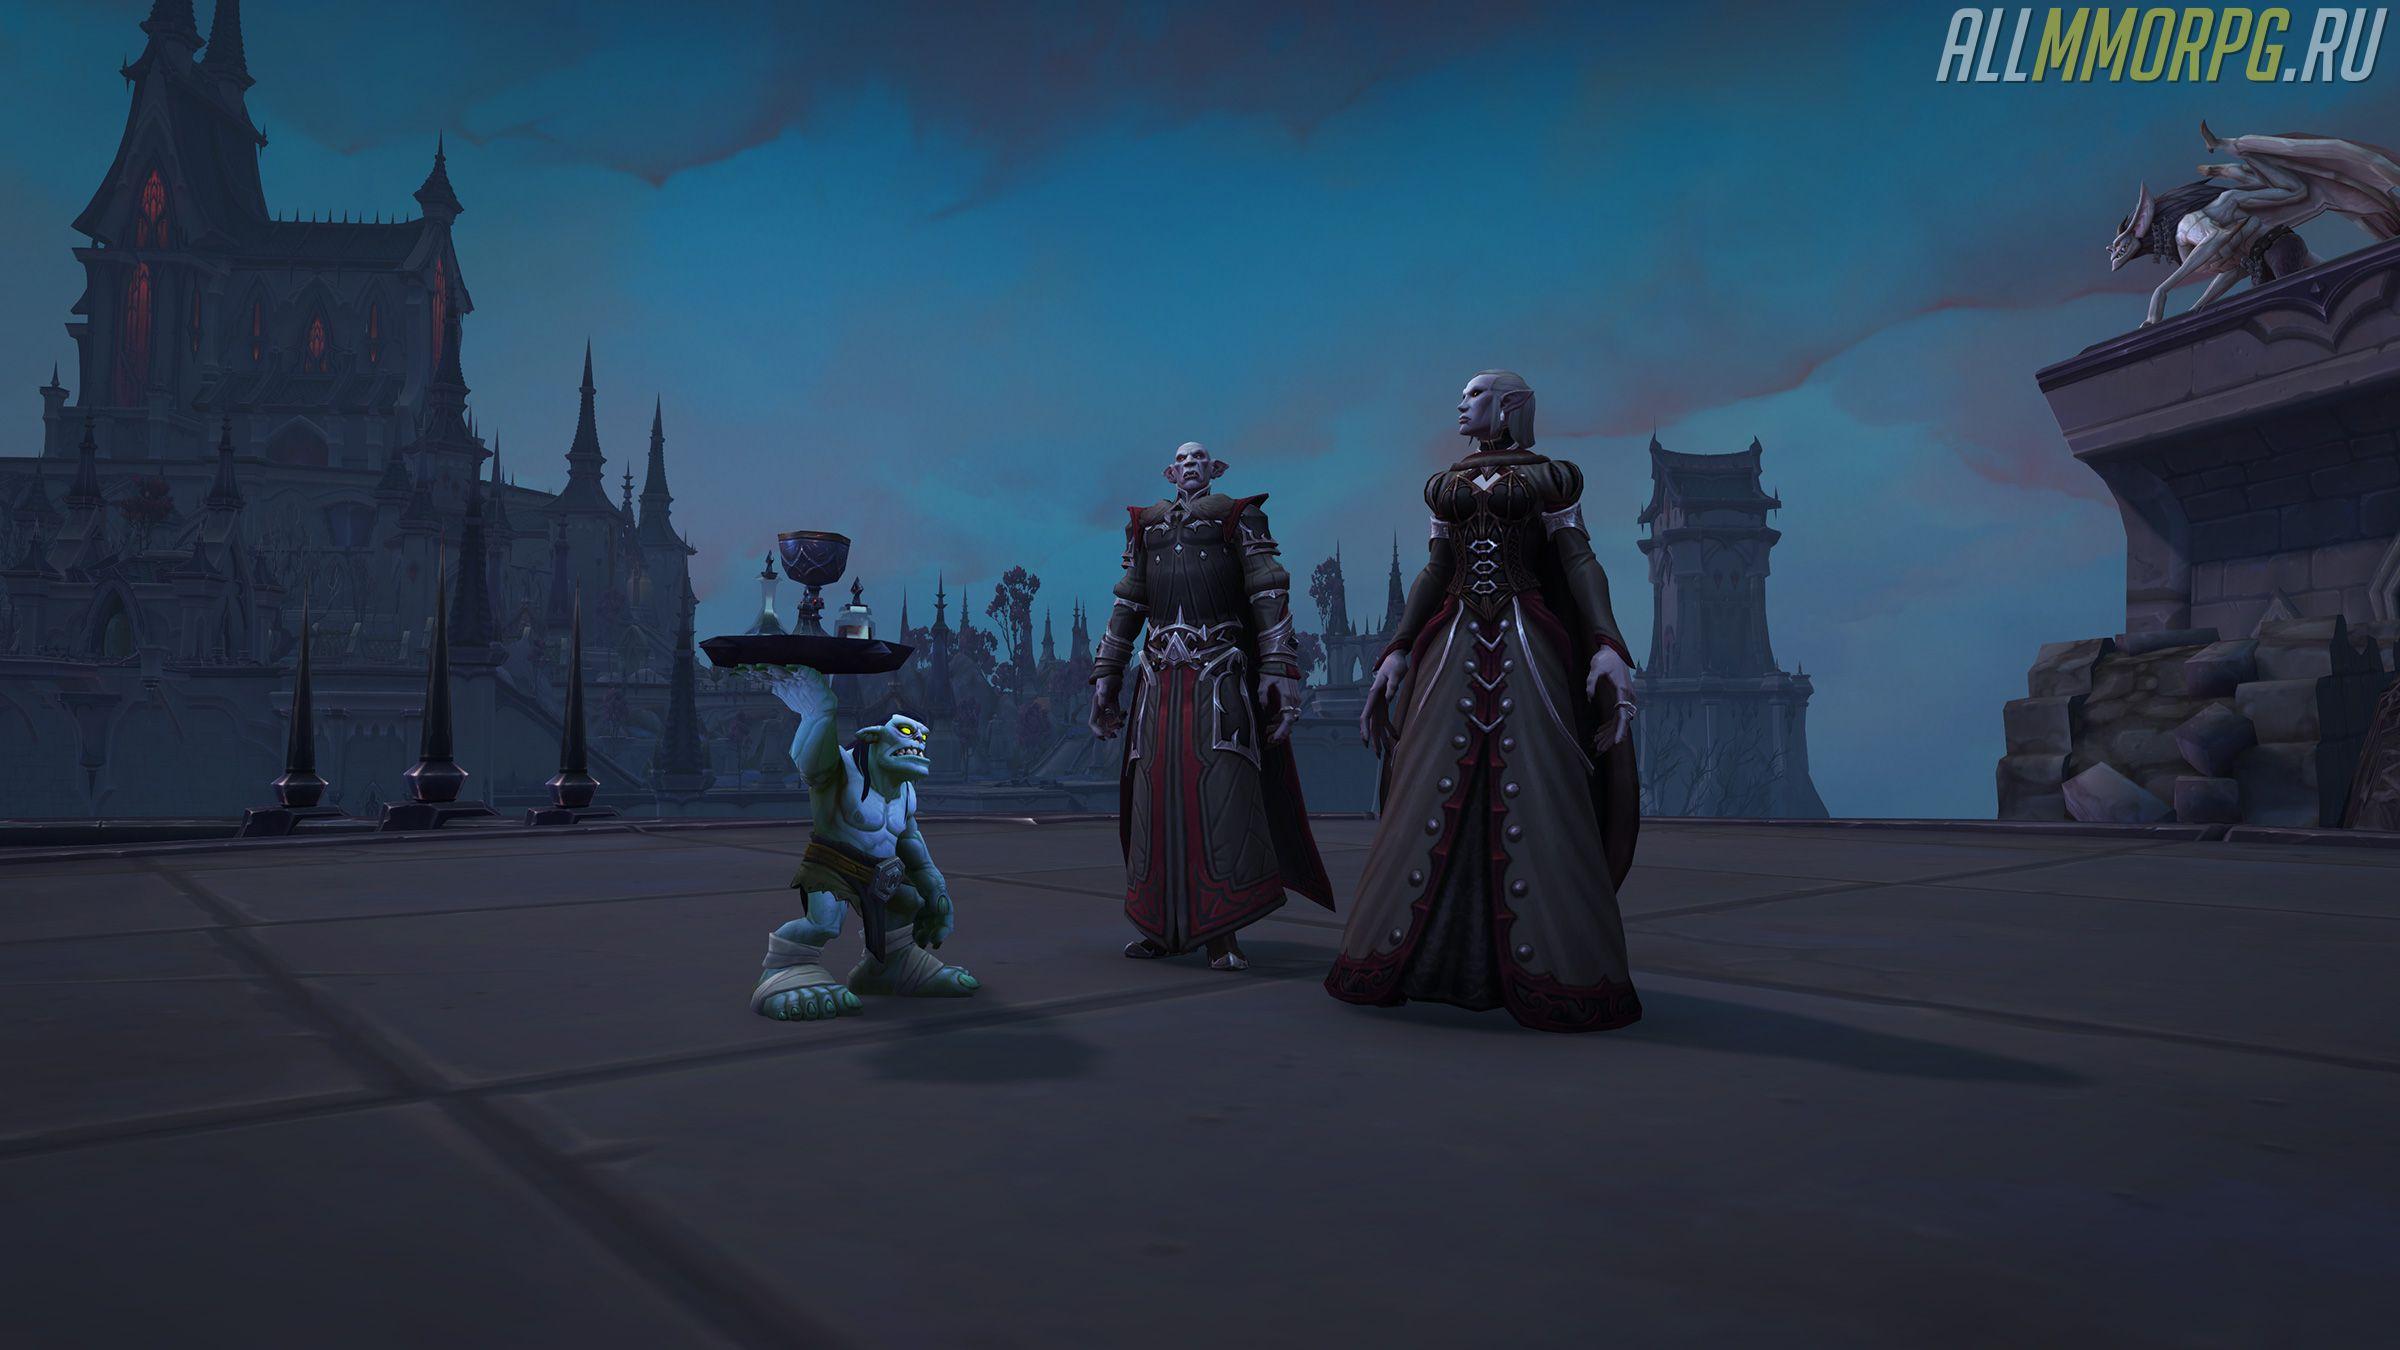 Ковенант: Вентиры (WoW Shadowlands)